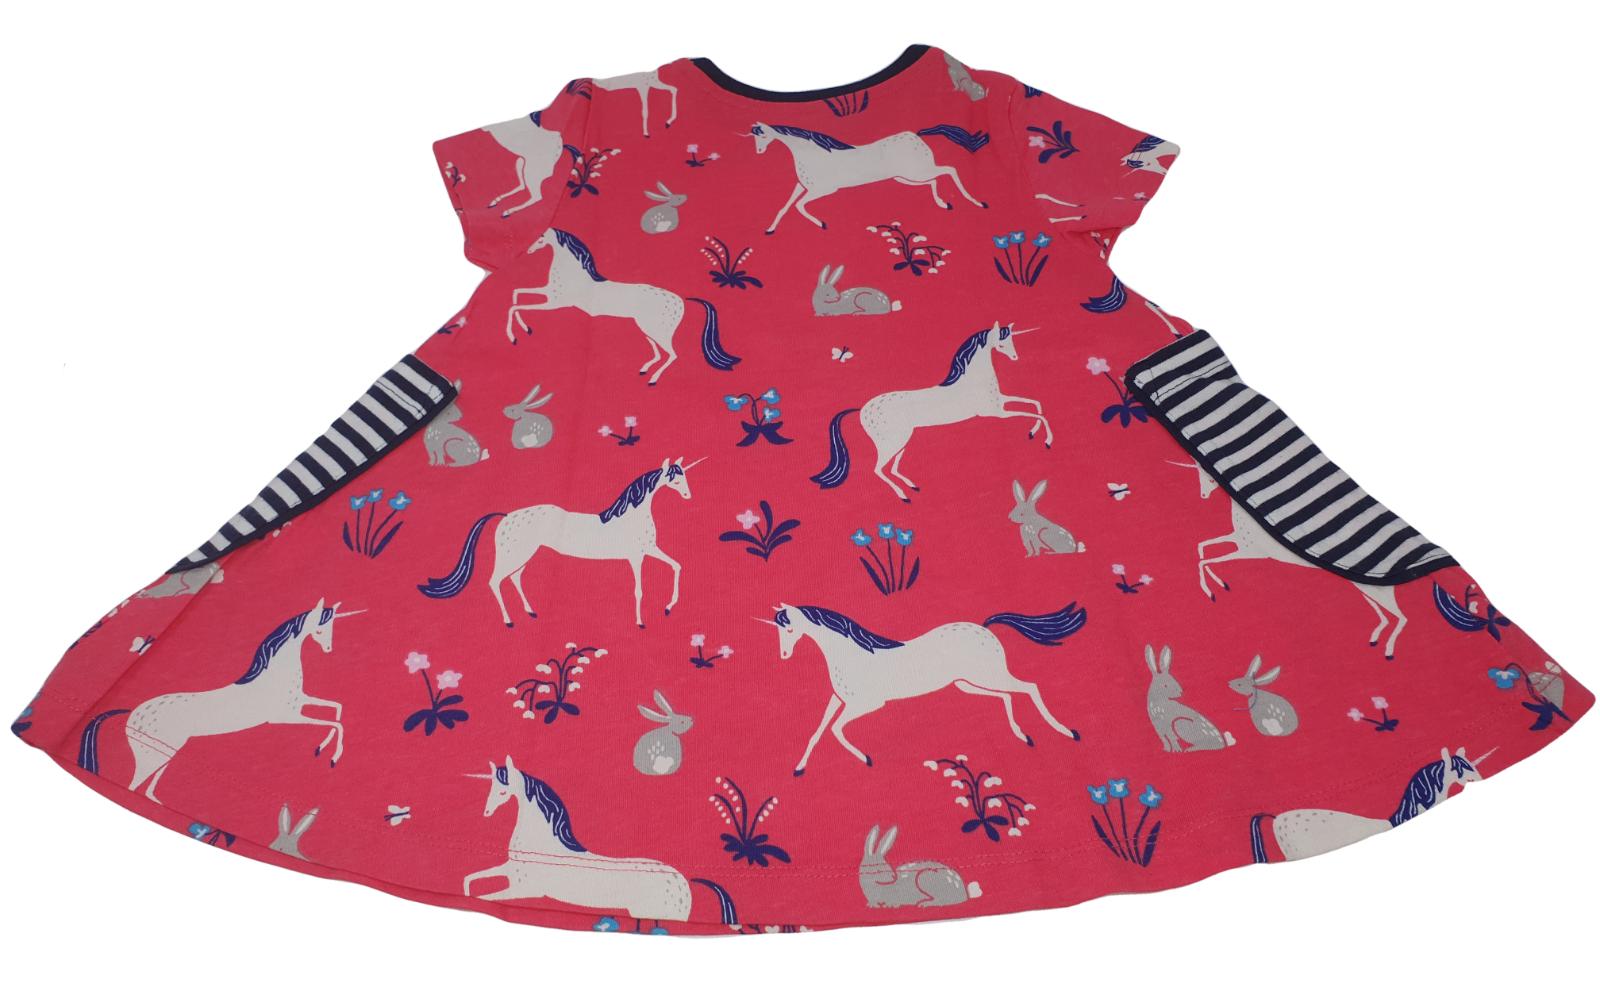 Ex Mini Boden Hotchpotch Tunic Dress in Horse Design 2-12 yrs NEW